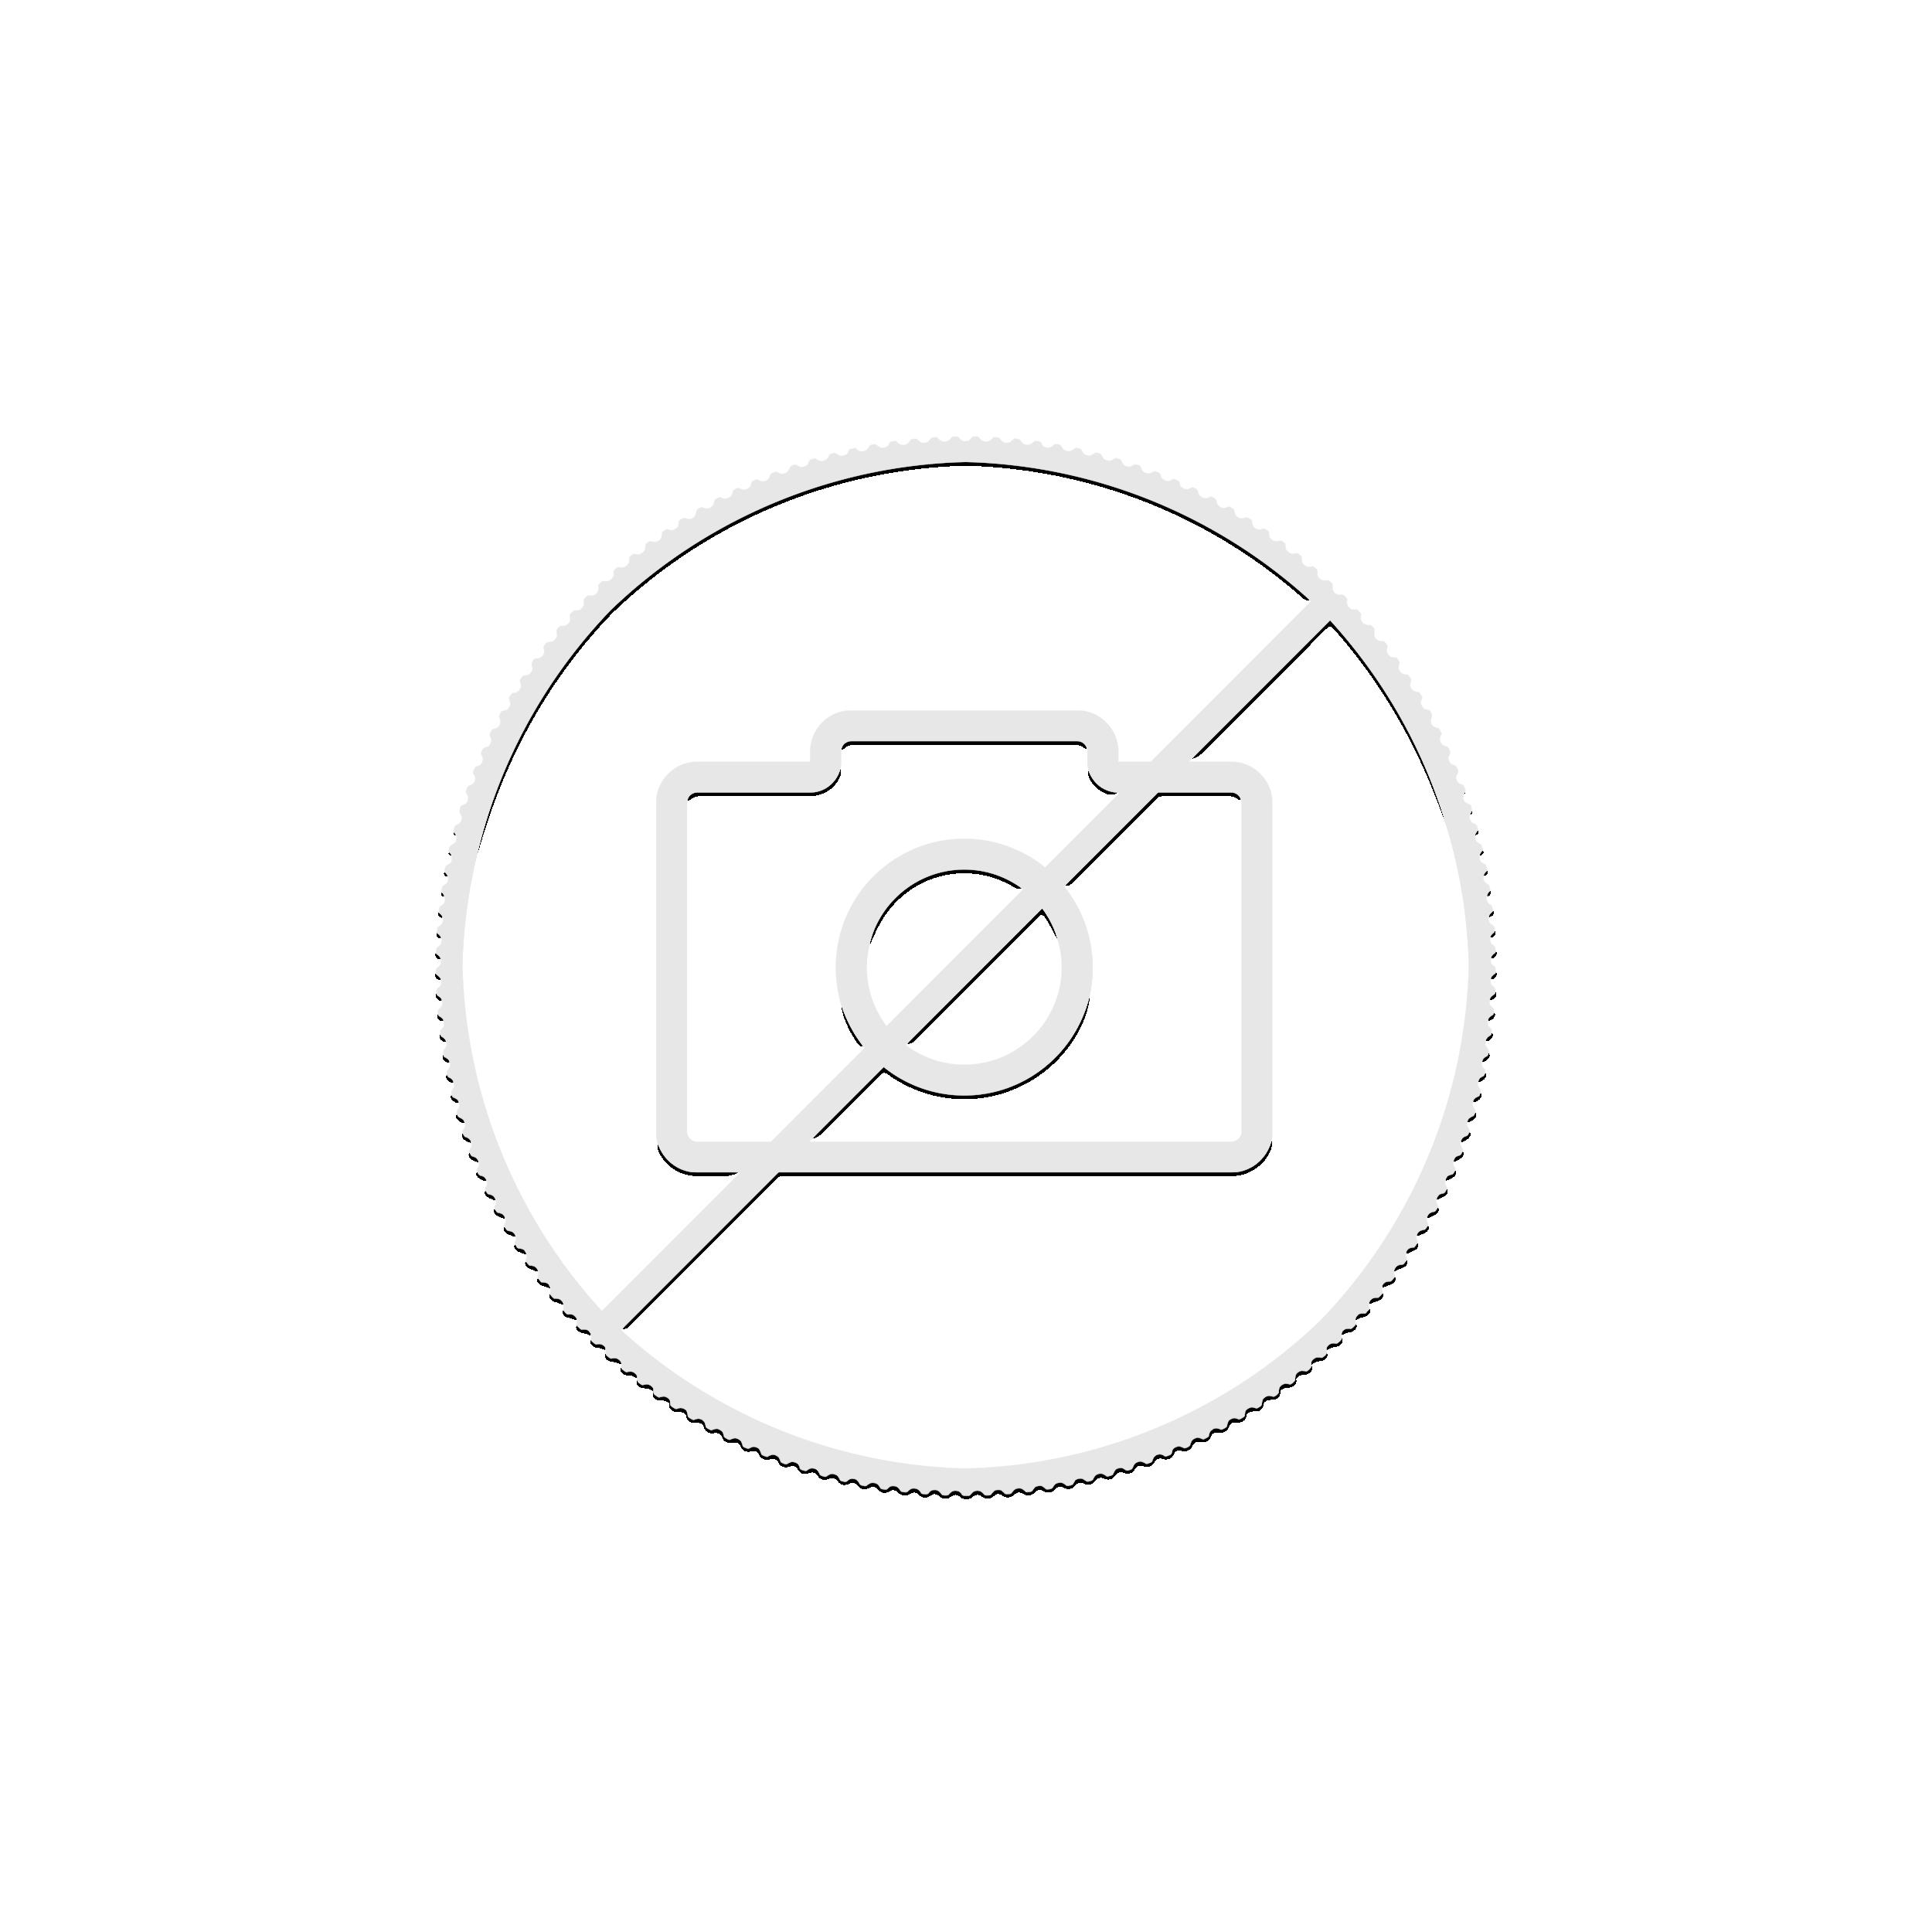 2 troy ounce zilveren munt masker 2021 - antieke afwerking